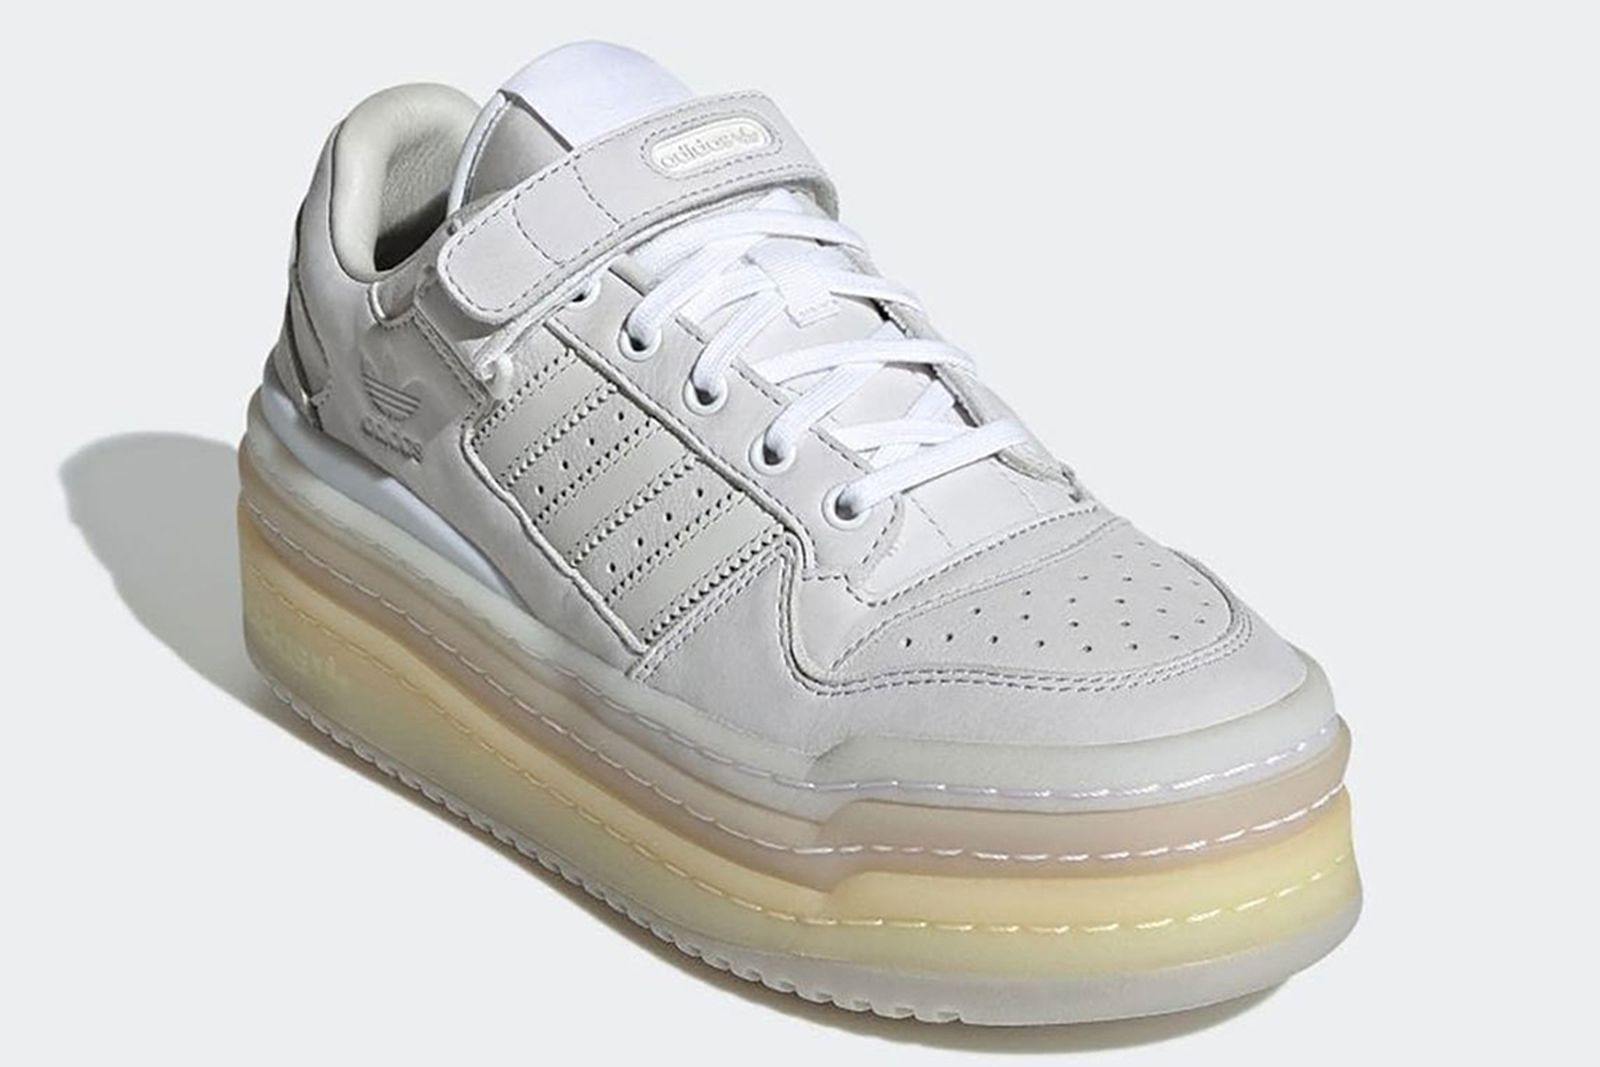 adidas-triple-platforum-lo-crystal-white-release-date-price-03